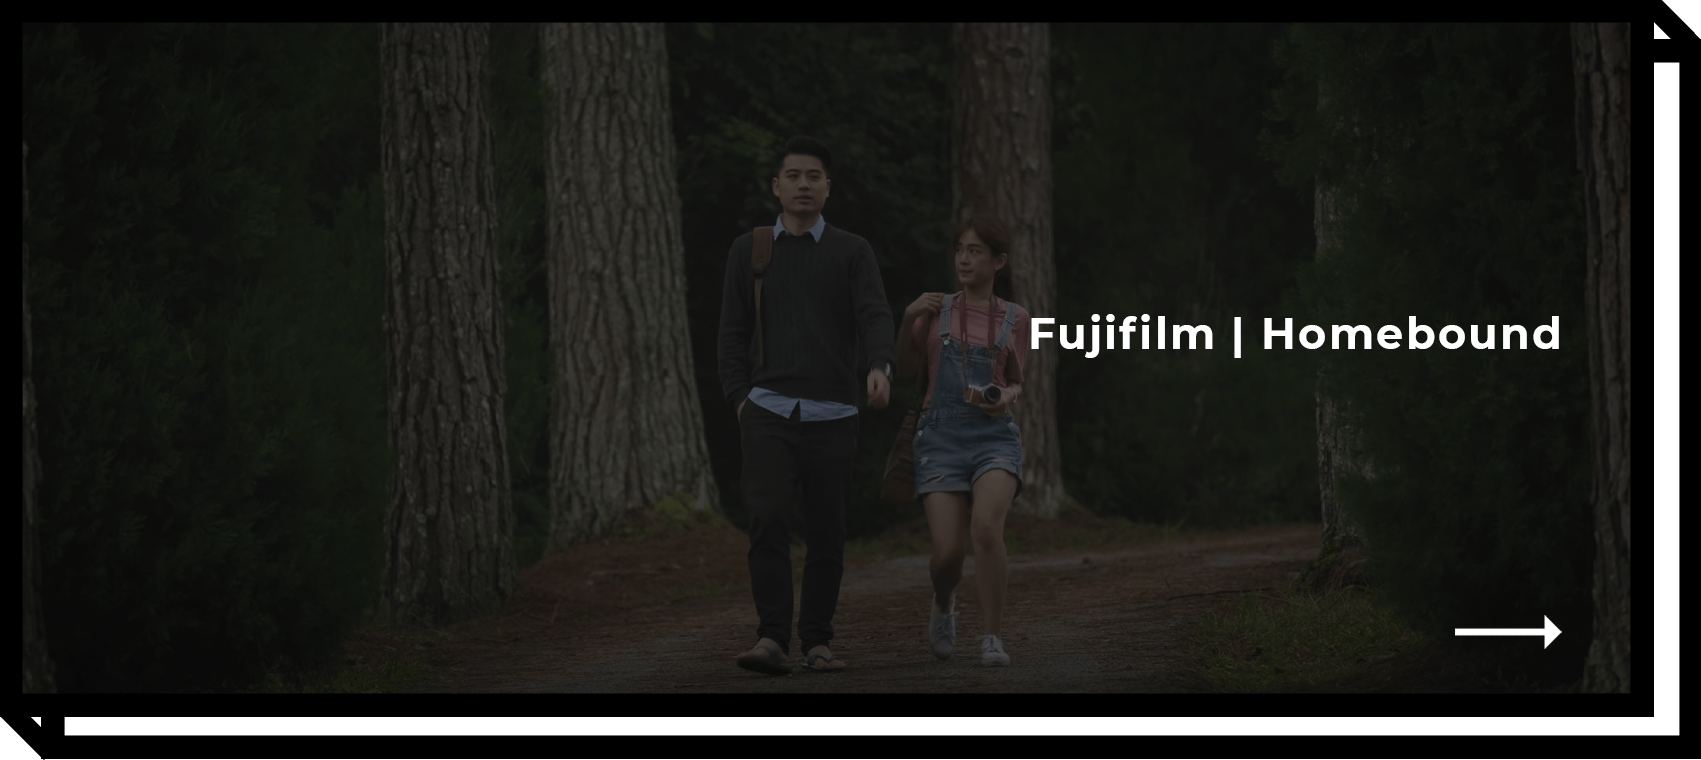 Fujifilm - Homebound